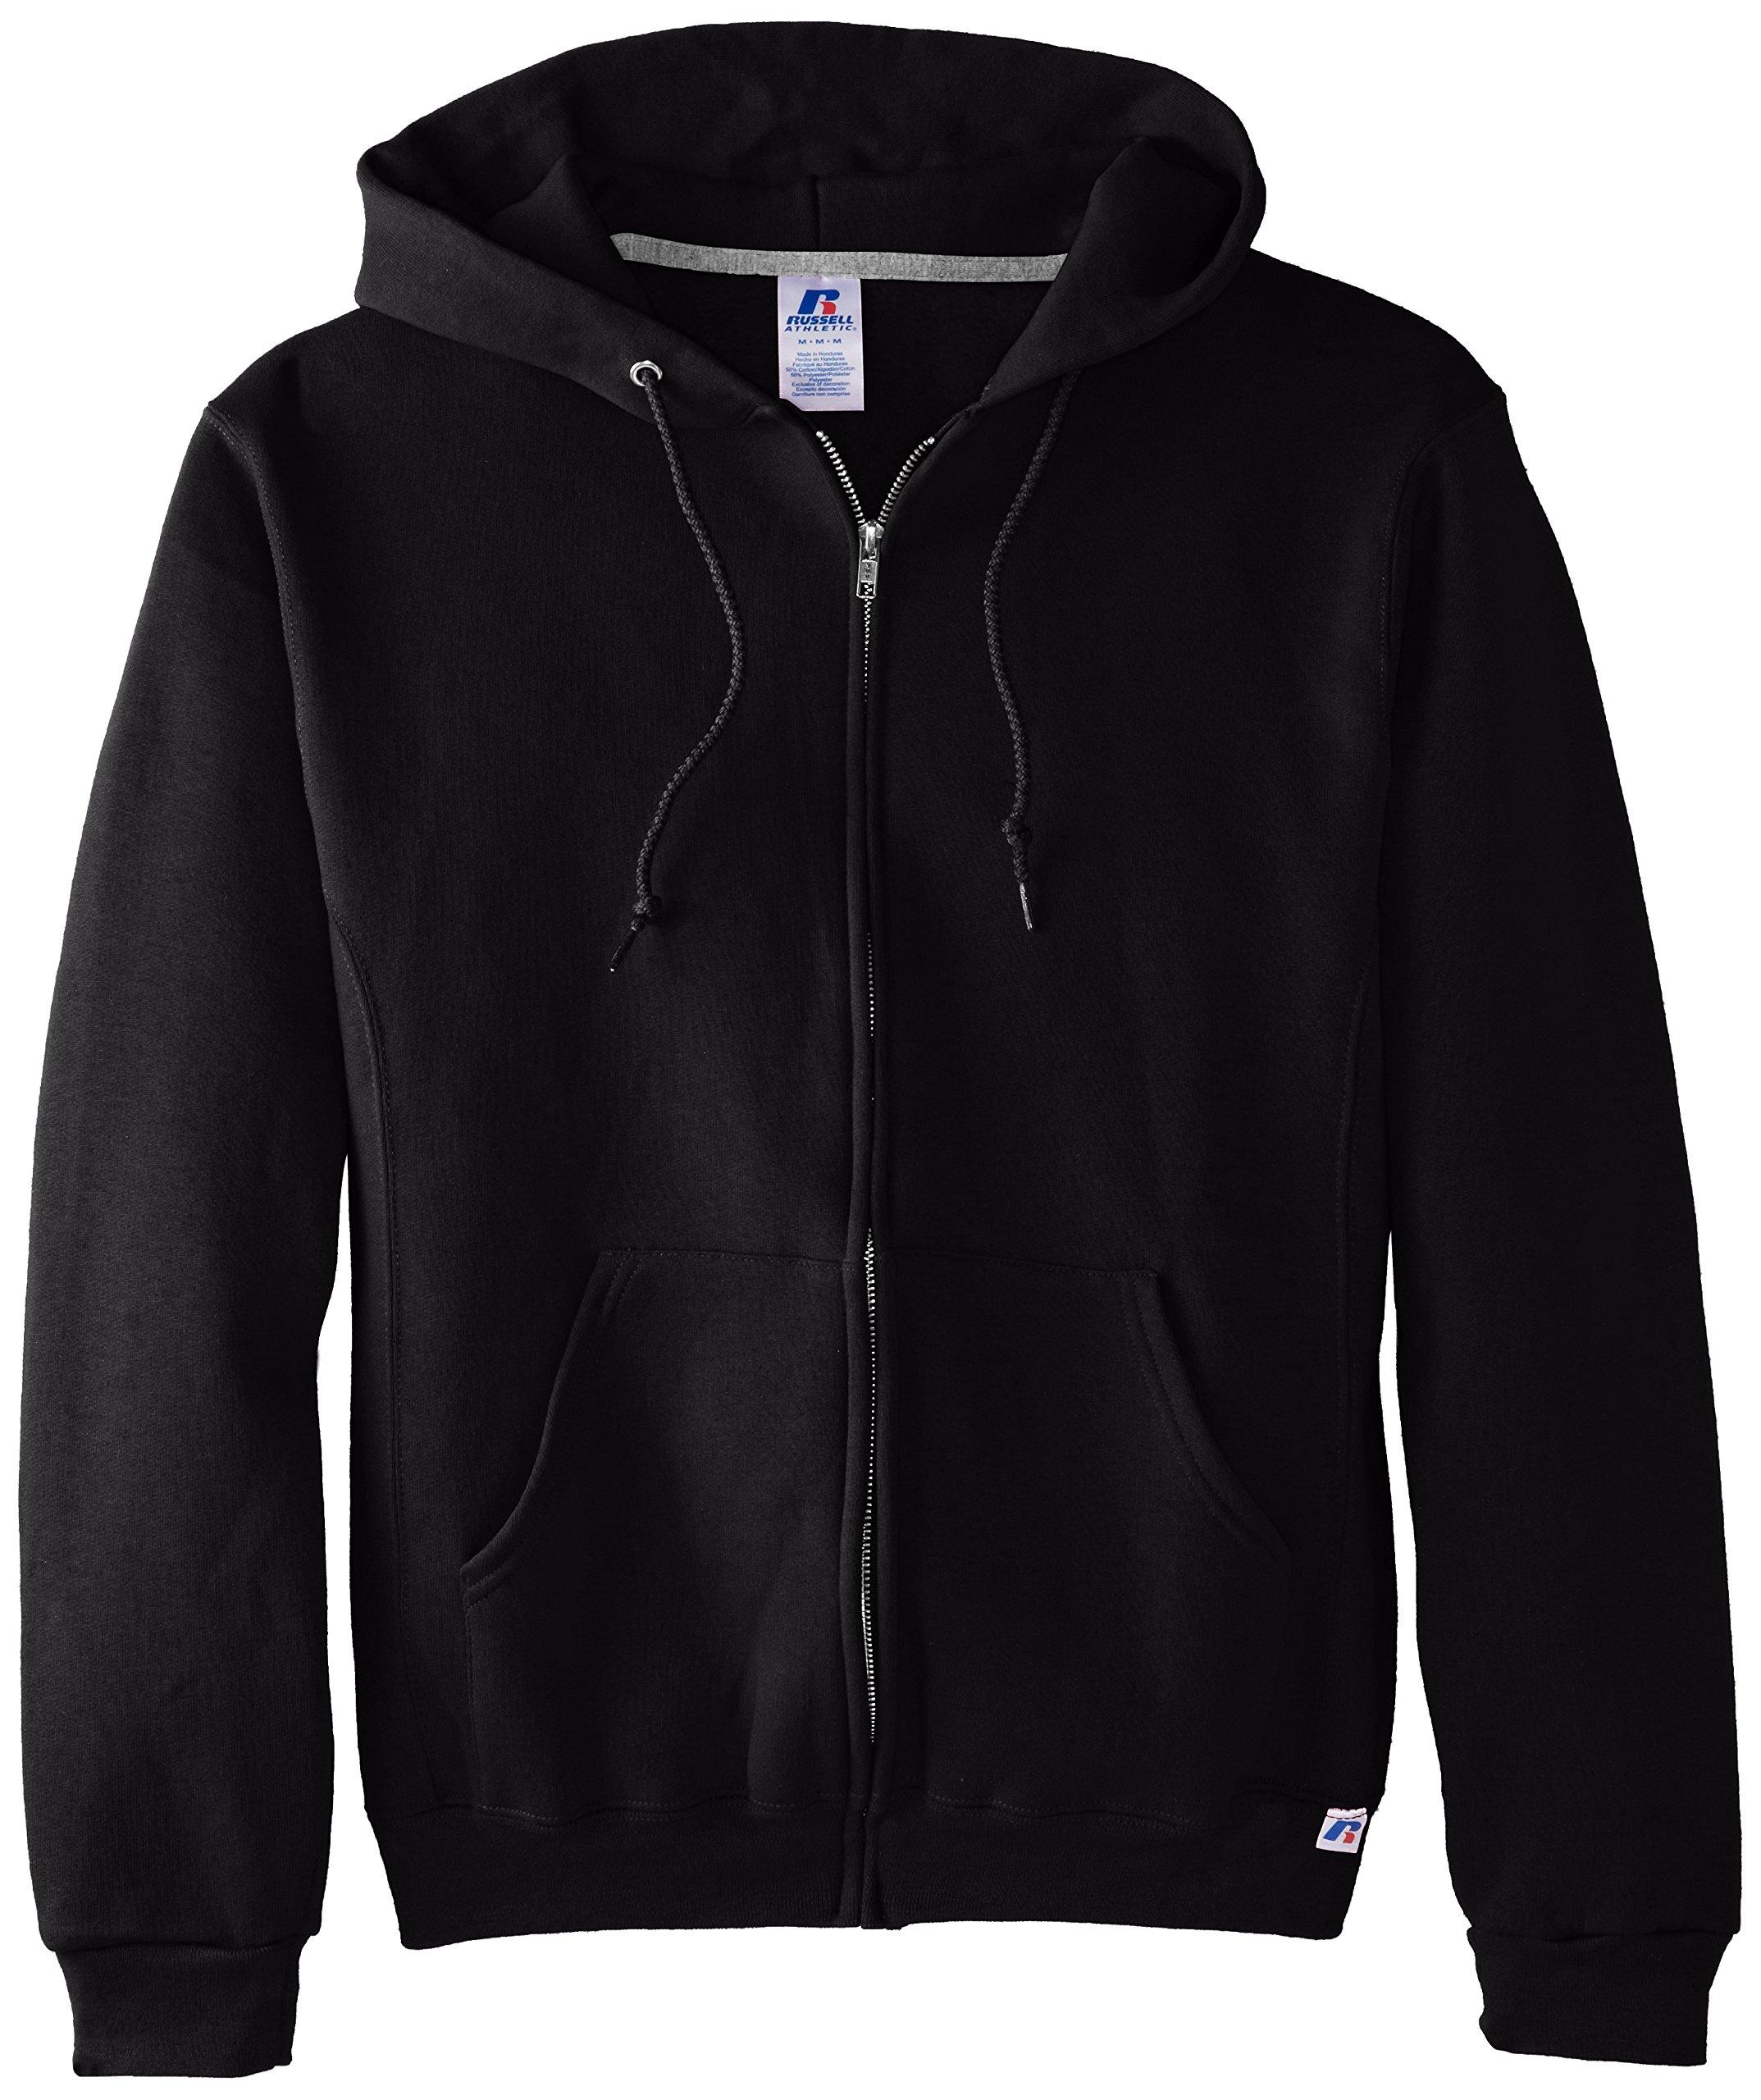 Russell Athletic Men's Dri Power Full Zip Fleece Hoodie, Black, XXX-Large by Russell Athletic